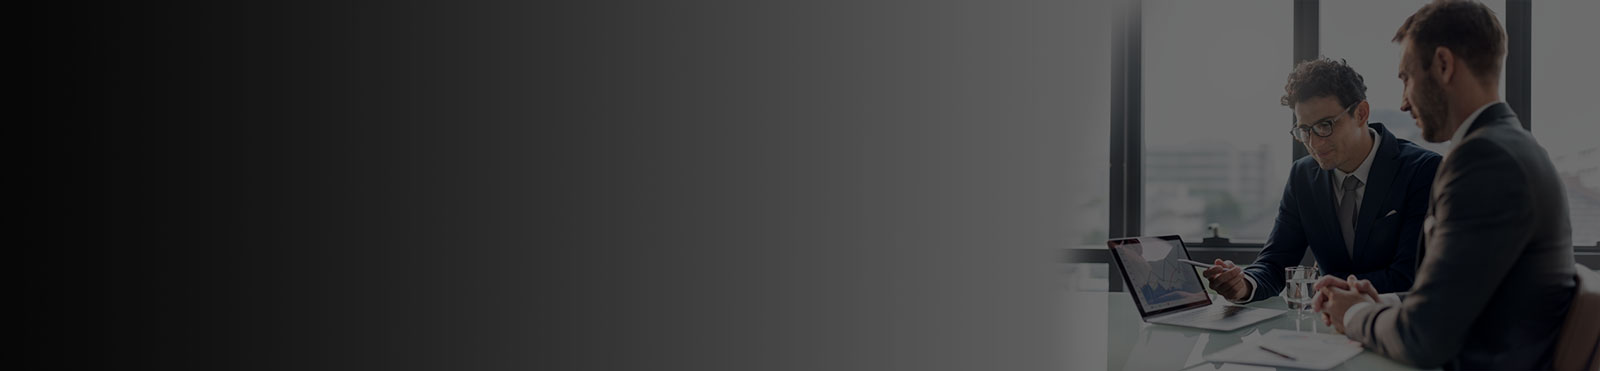 iprocess-data-main-banner